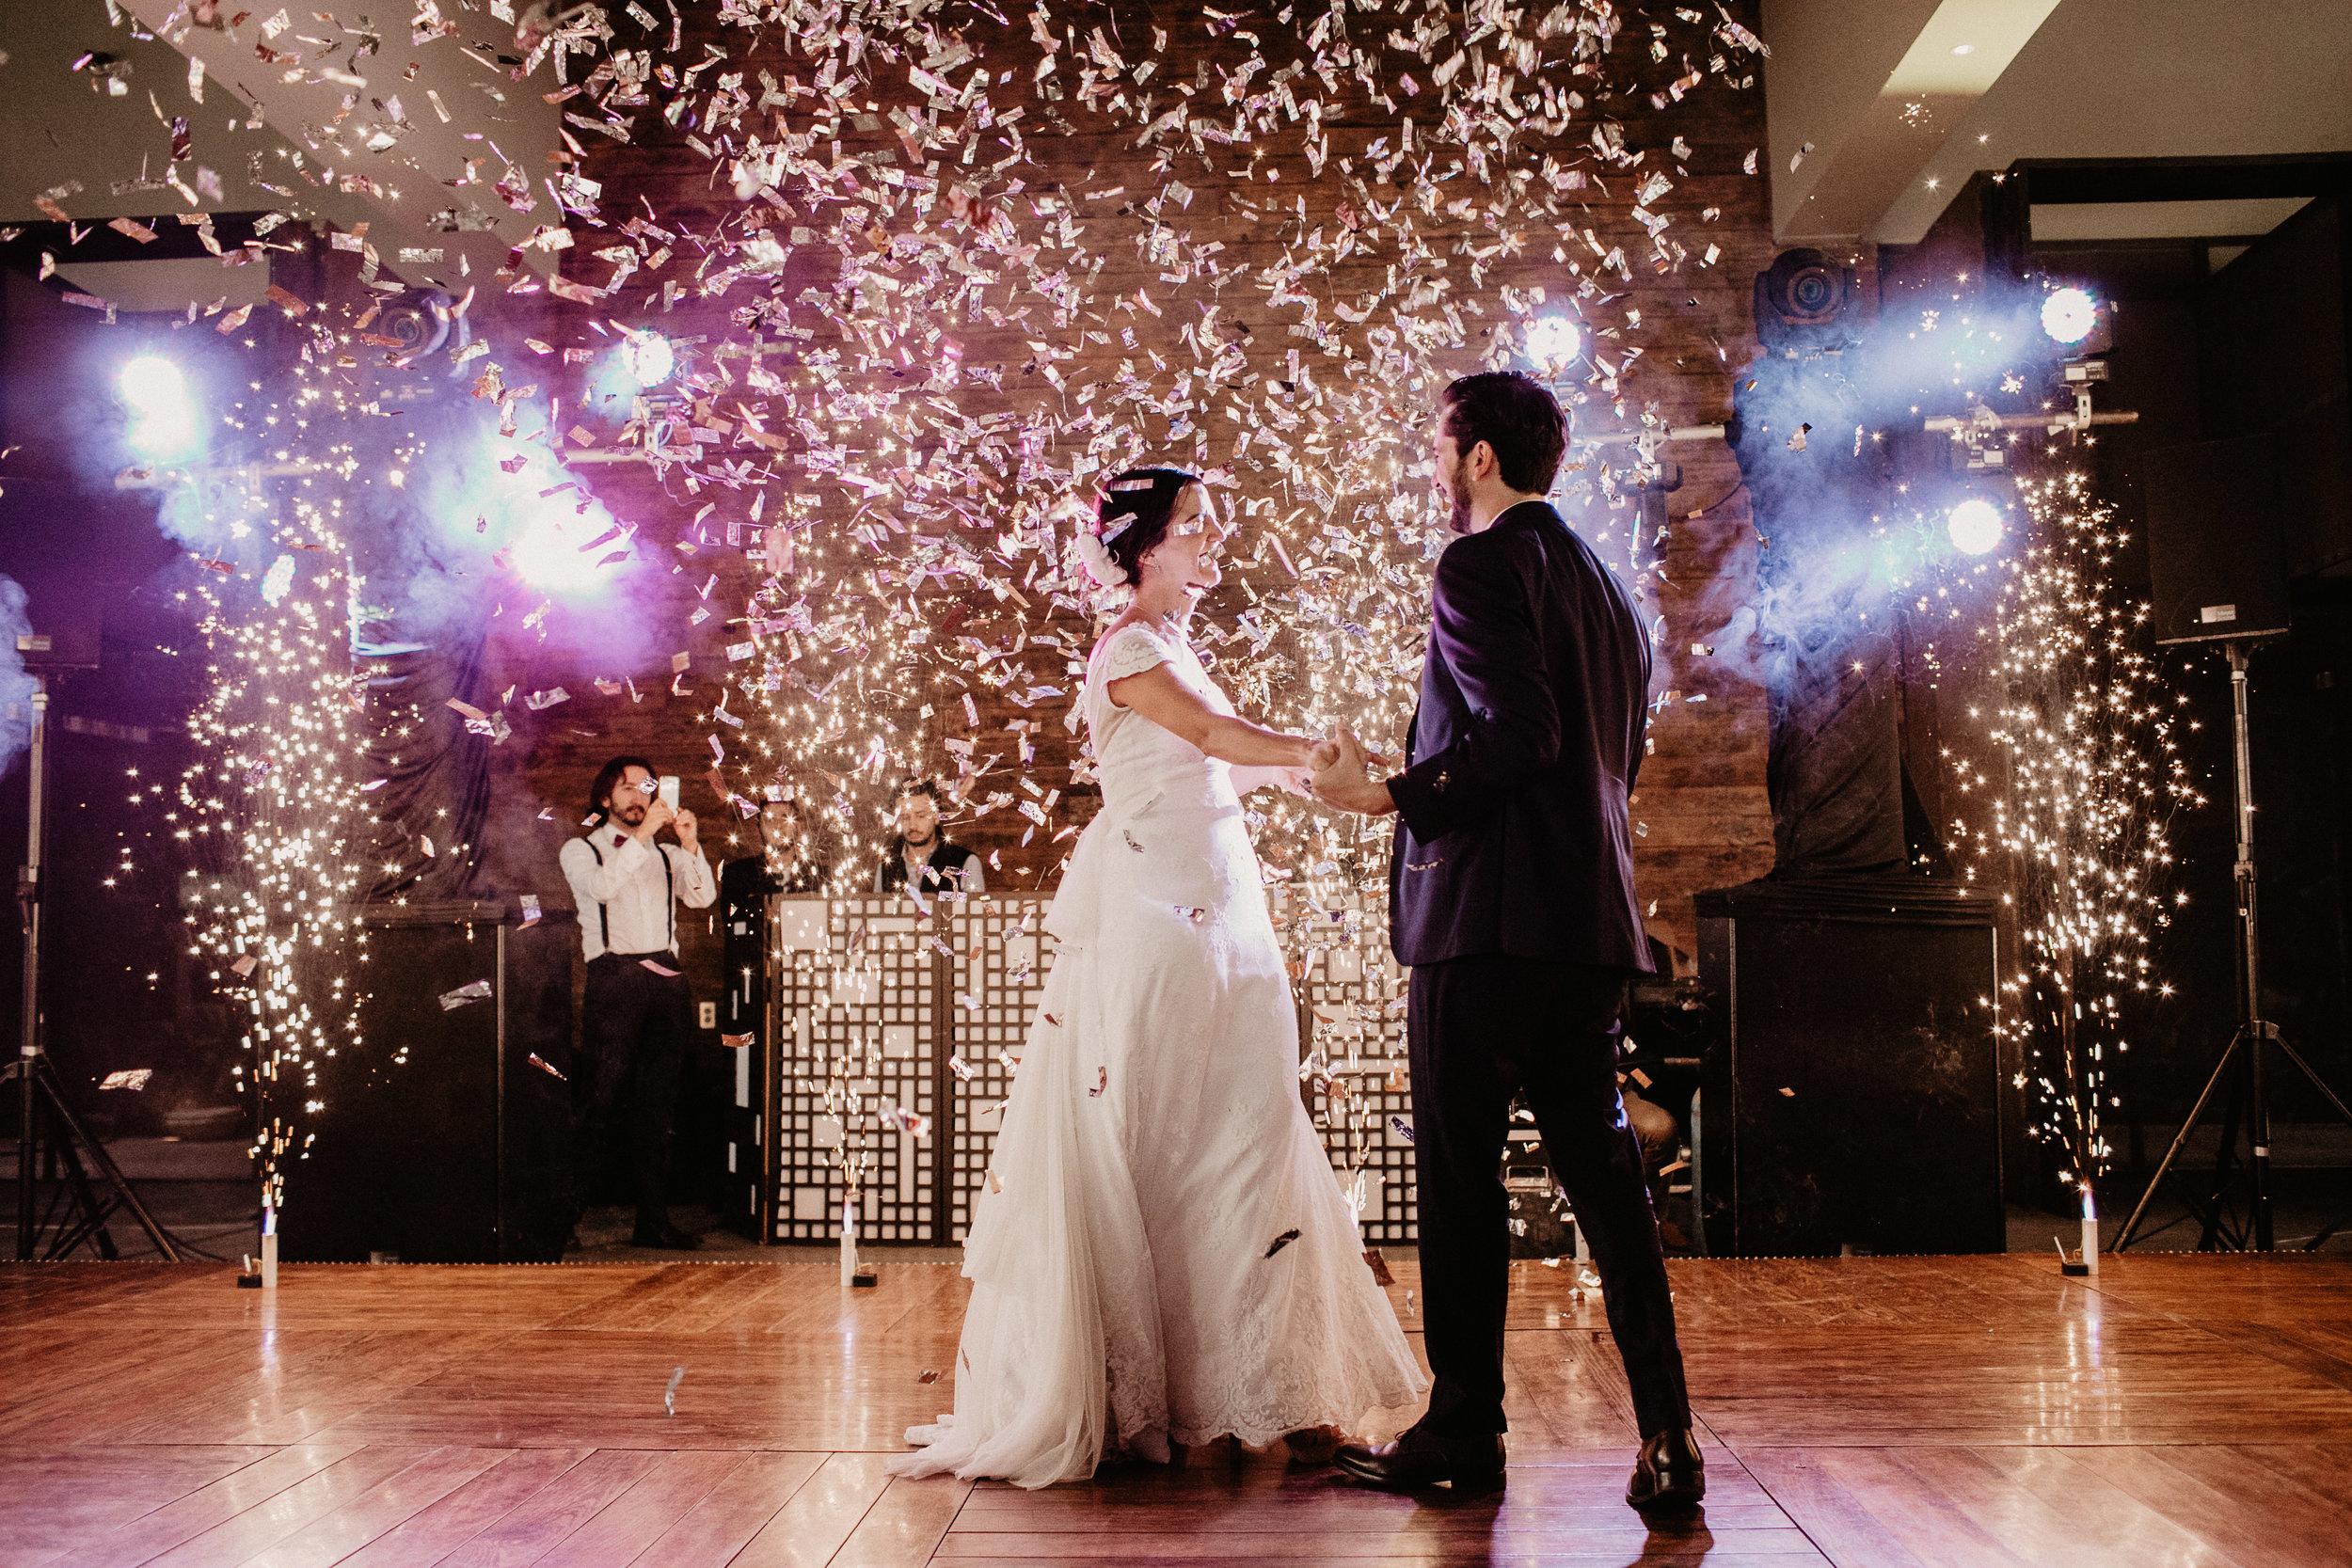 alfonso_flores_destination_wedding_photographer_pau_alonso_838.JPG